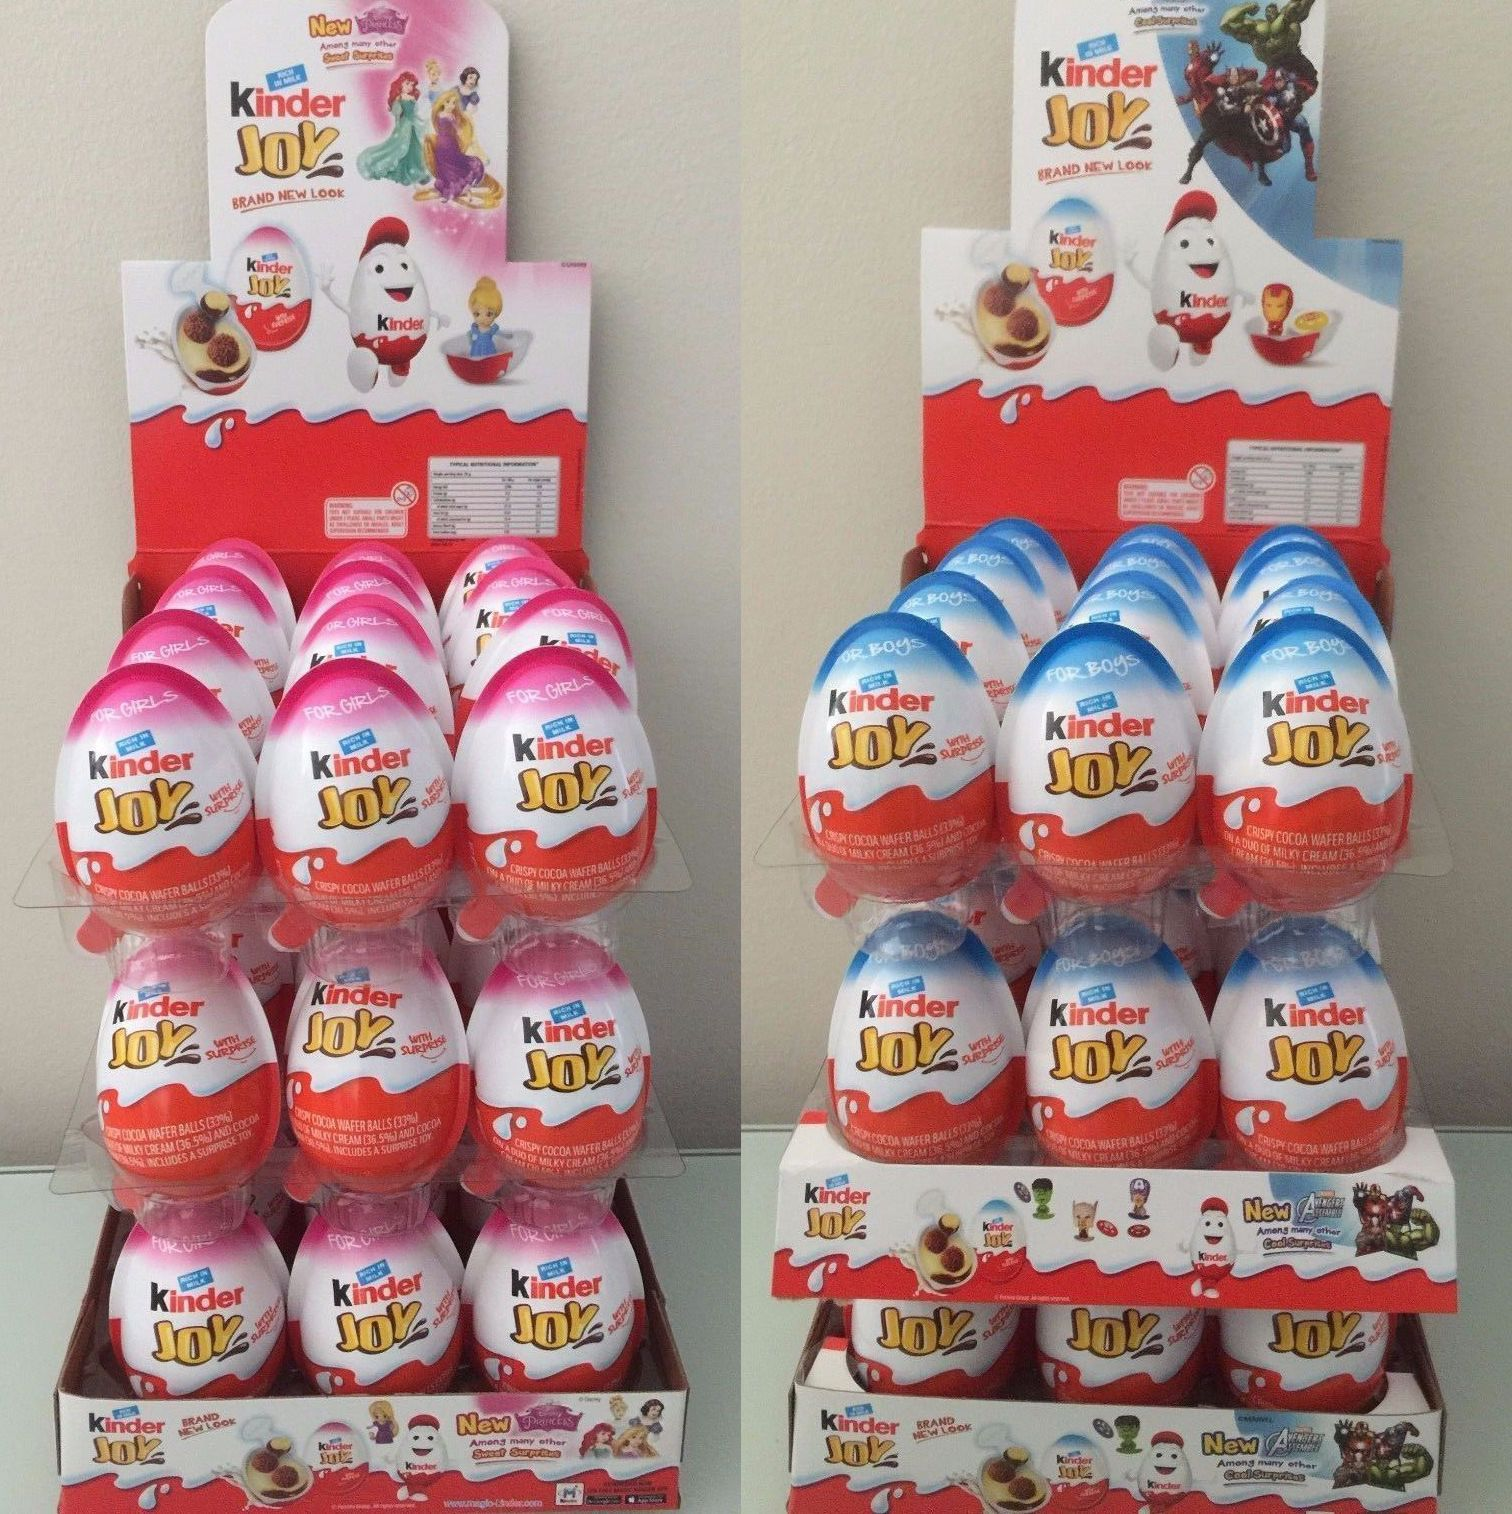 Kinder joy toys car  Kinder JOY Surprise Eggs for BOYS u GIRLS Chocolate Toy InsideKids